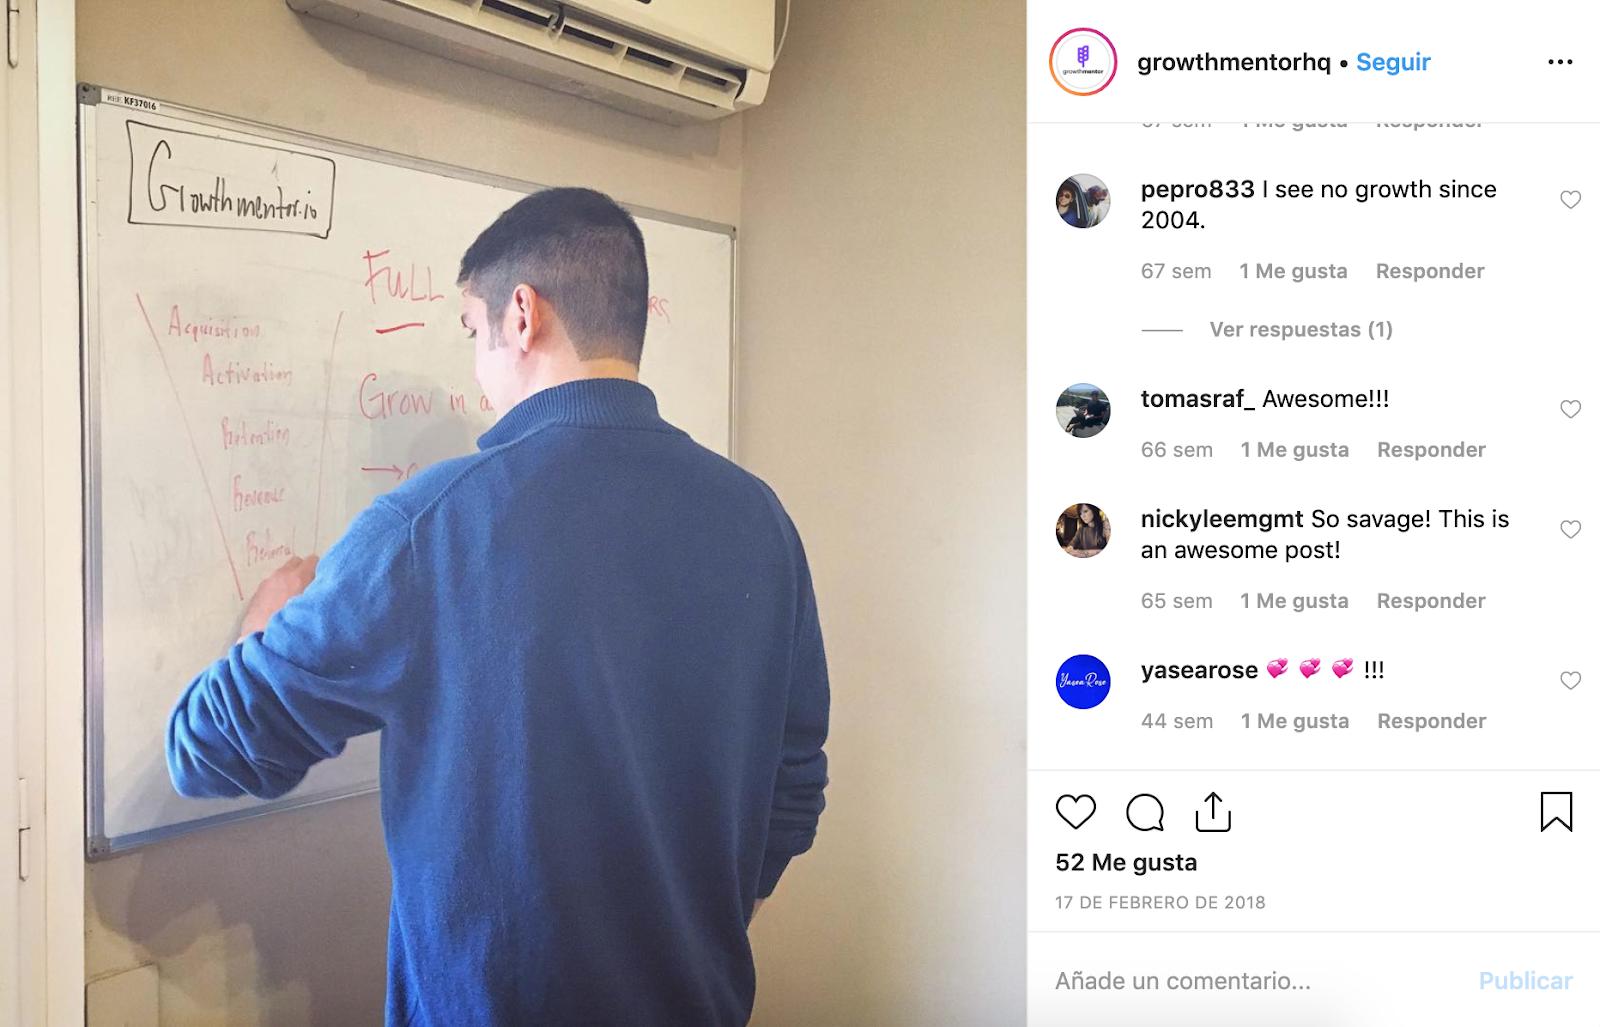 GrowthMentor's Instagram